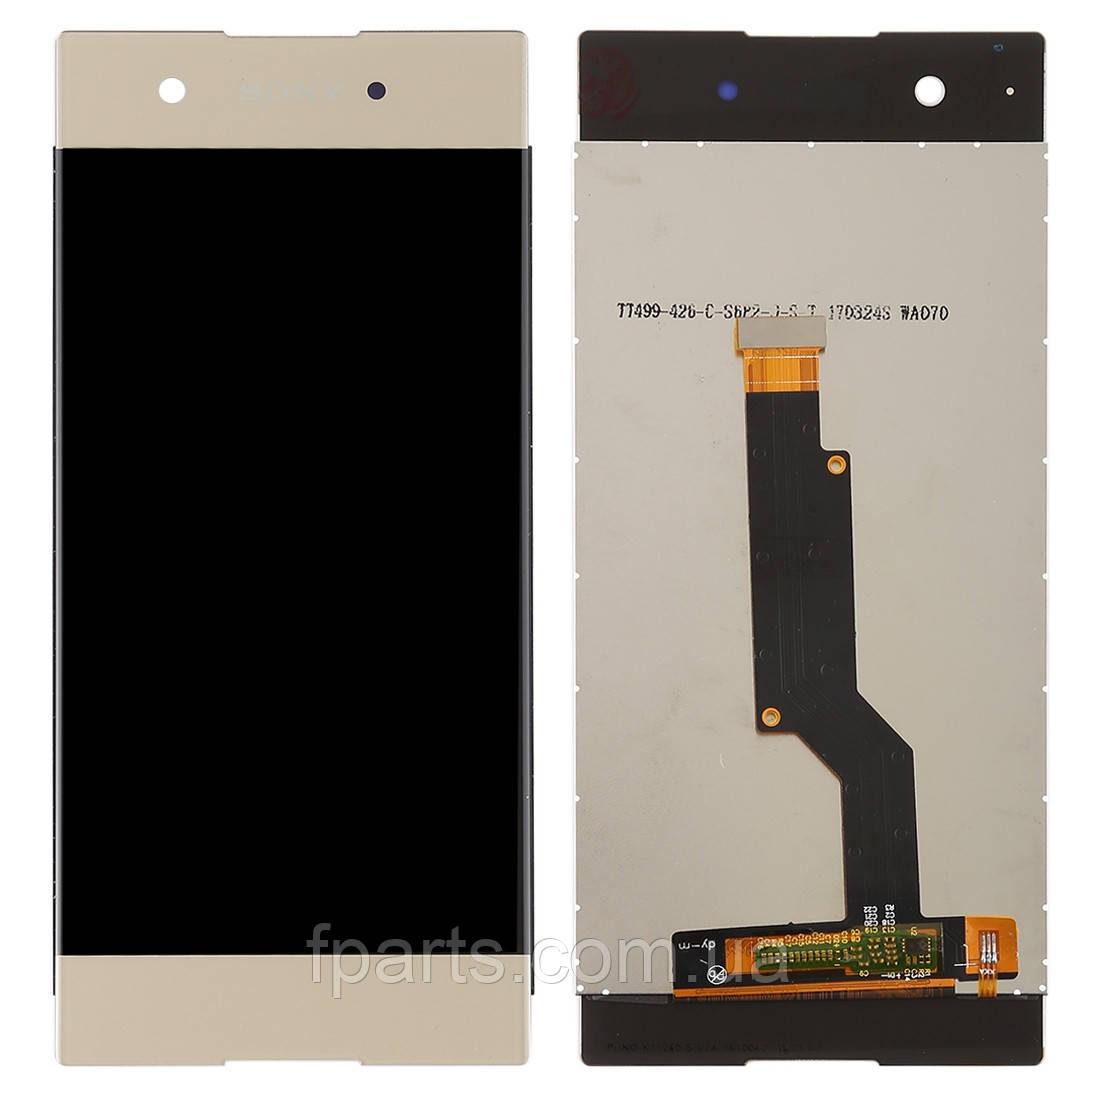 Дисплей для Sony Xperia XA1 G3112, G3116 с тачскрином, Gold